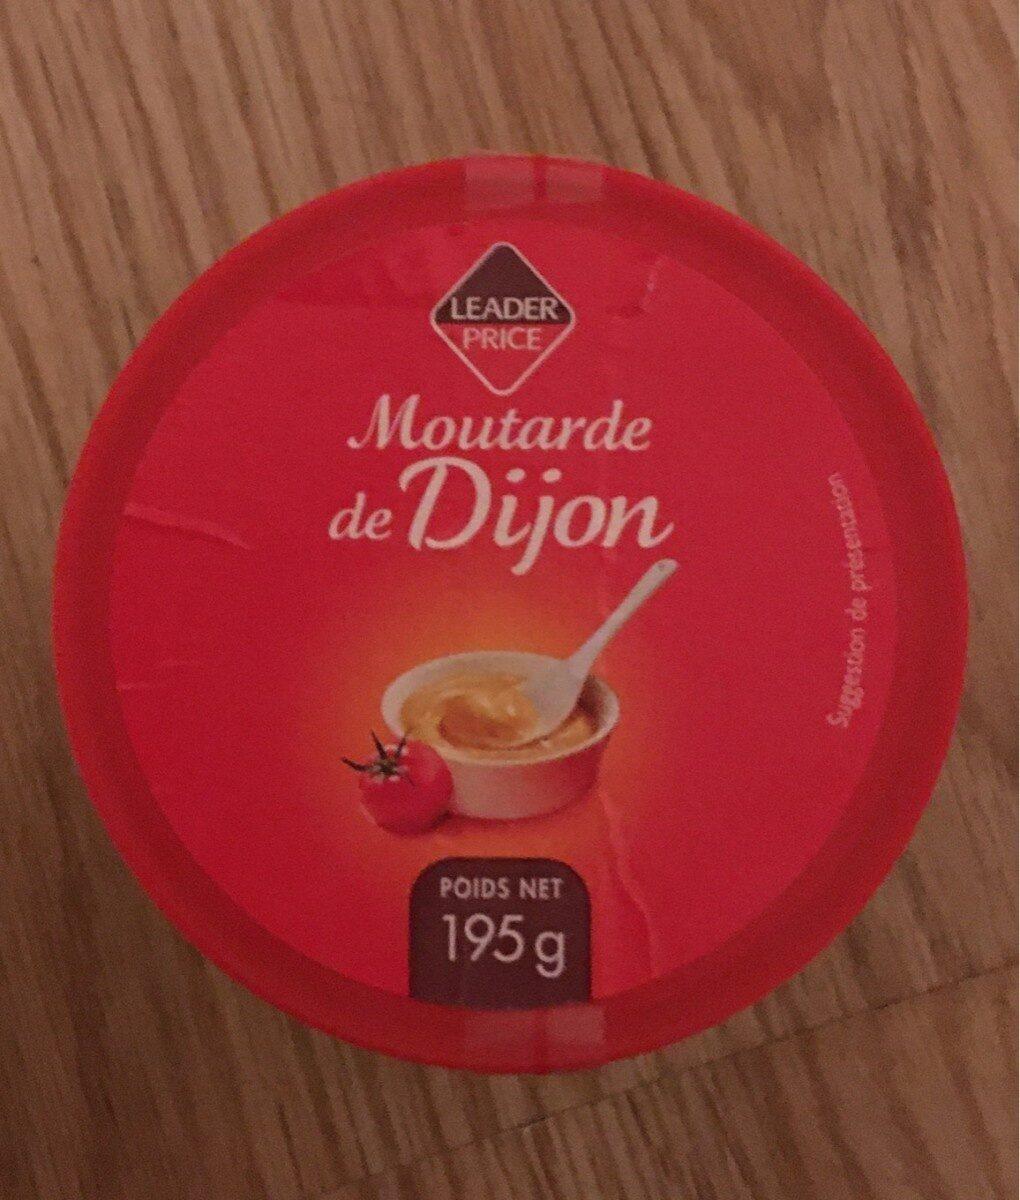 moutarde de dijon leader price - Product - fr